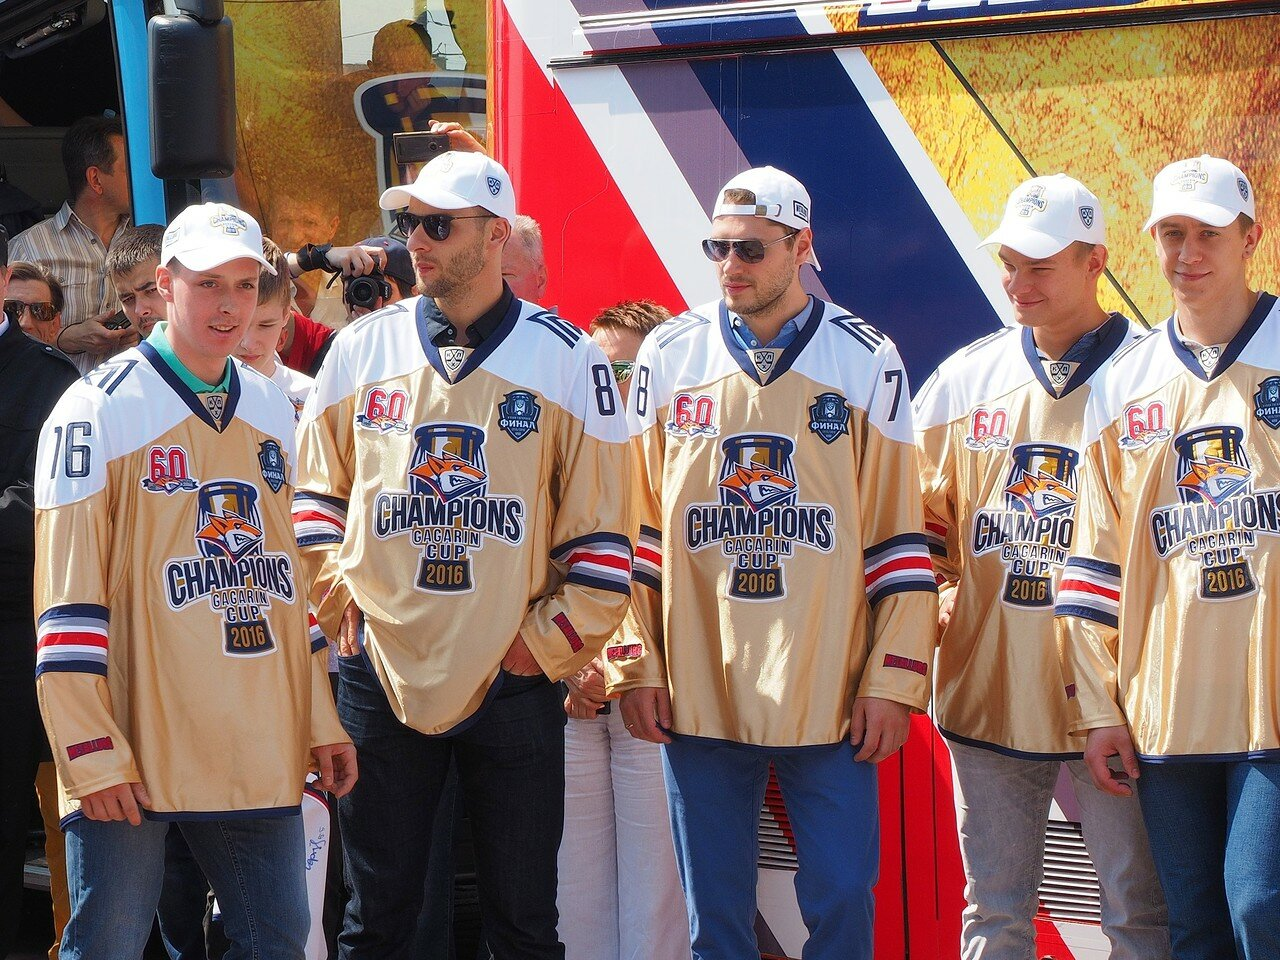 43Церемония чествования команды Металлург27.05.2016